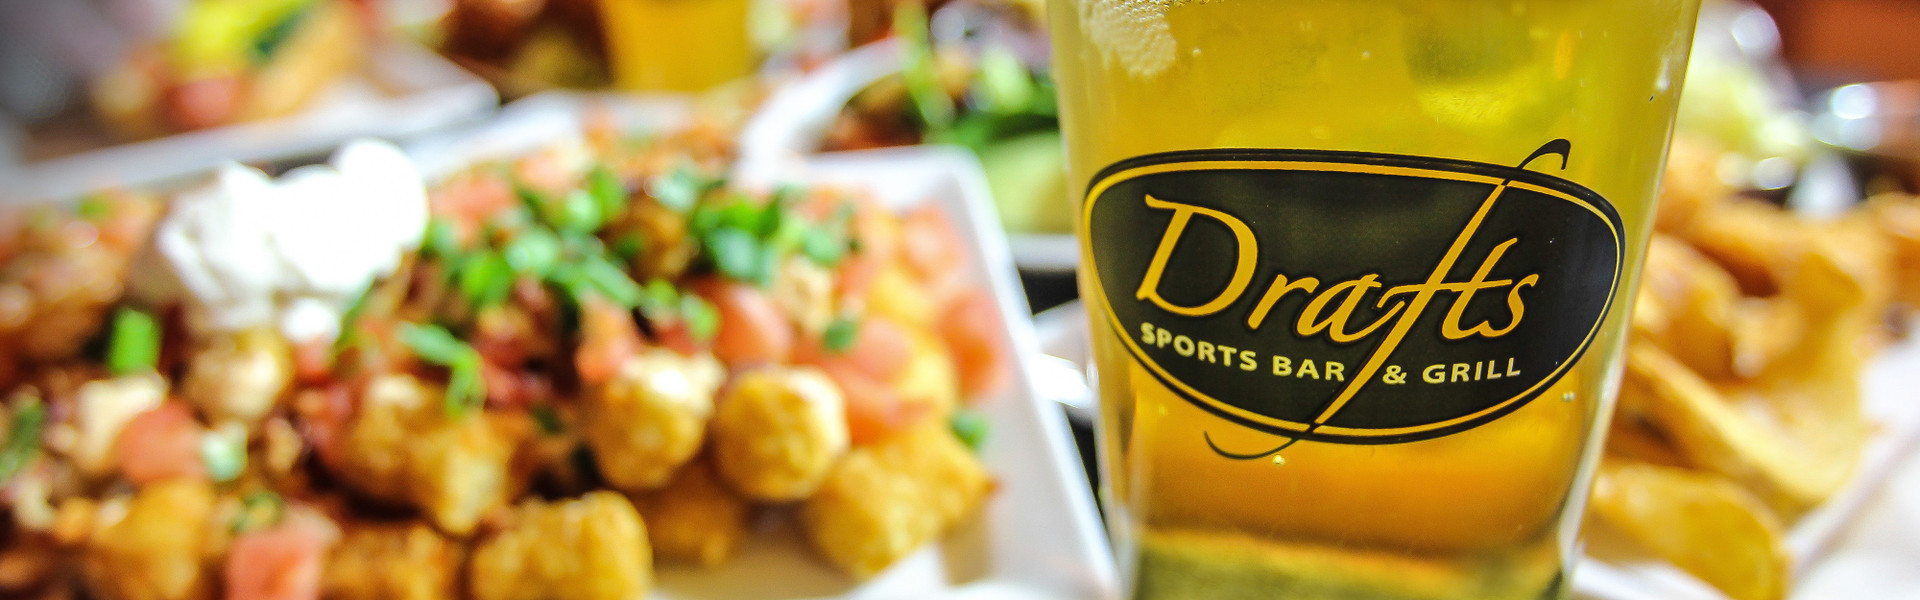 Drafts Sports Bar and Grill in Orlando, FL | Orlando Sports Bars | Westgate Lakes Resort & Spa